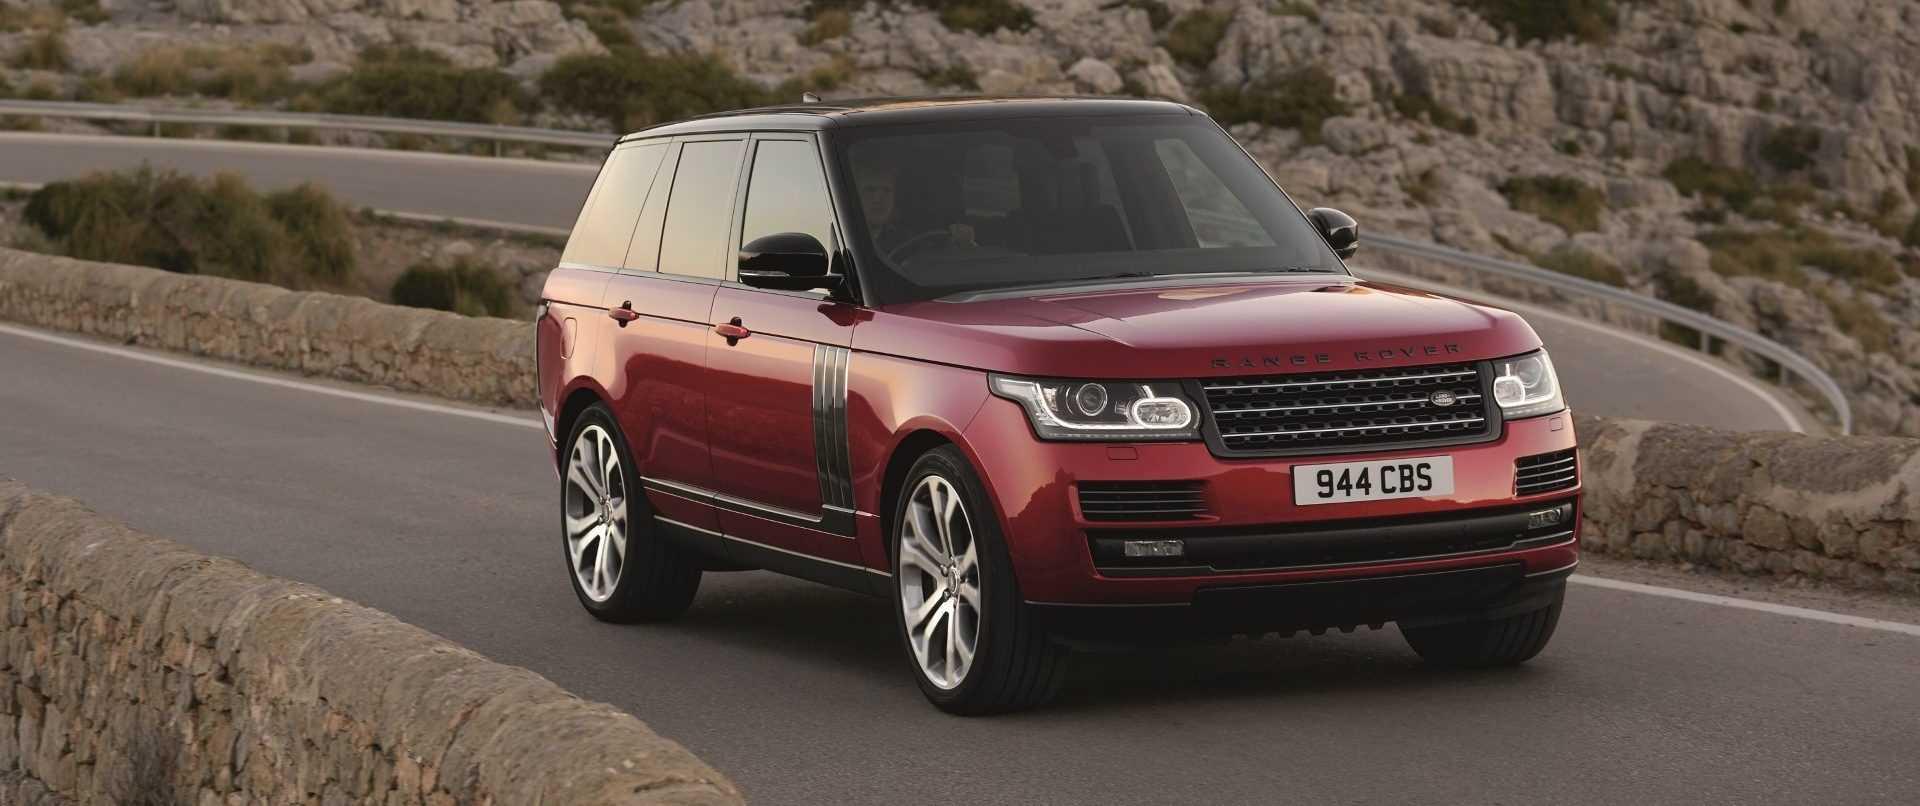 Range Rover SVAutobiography 2017